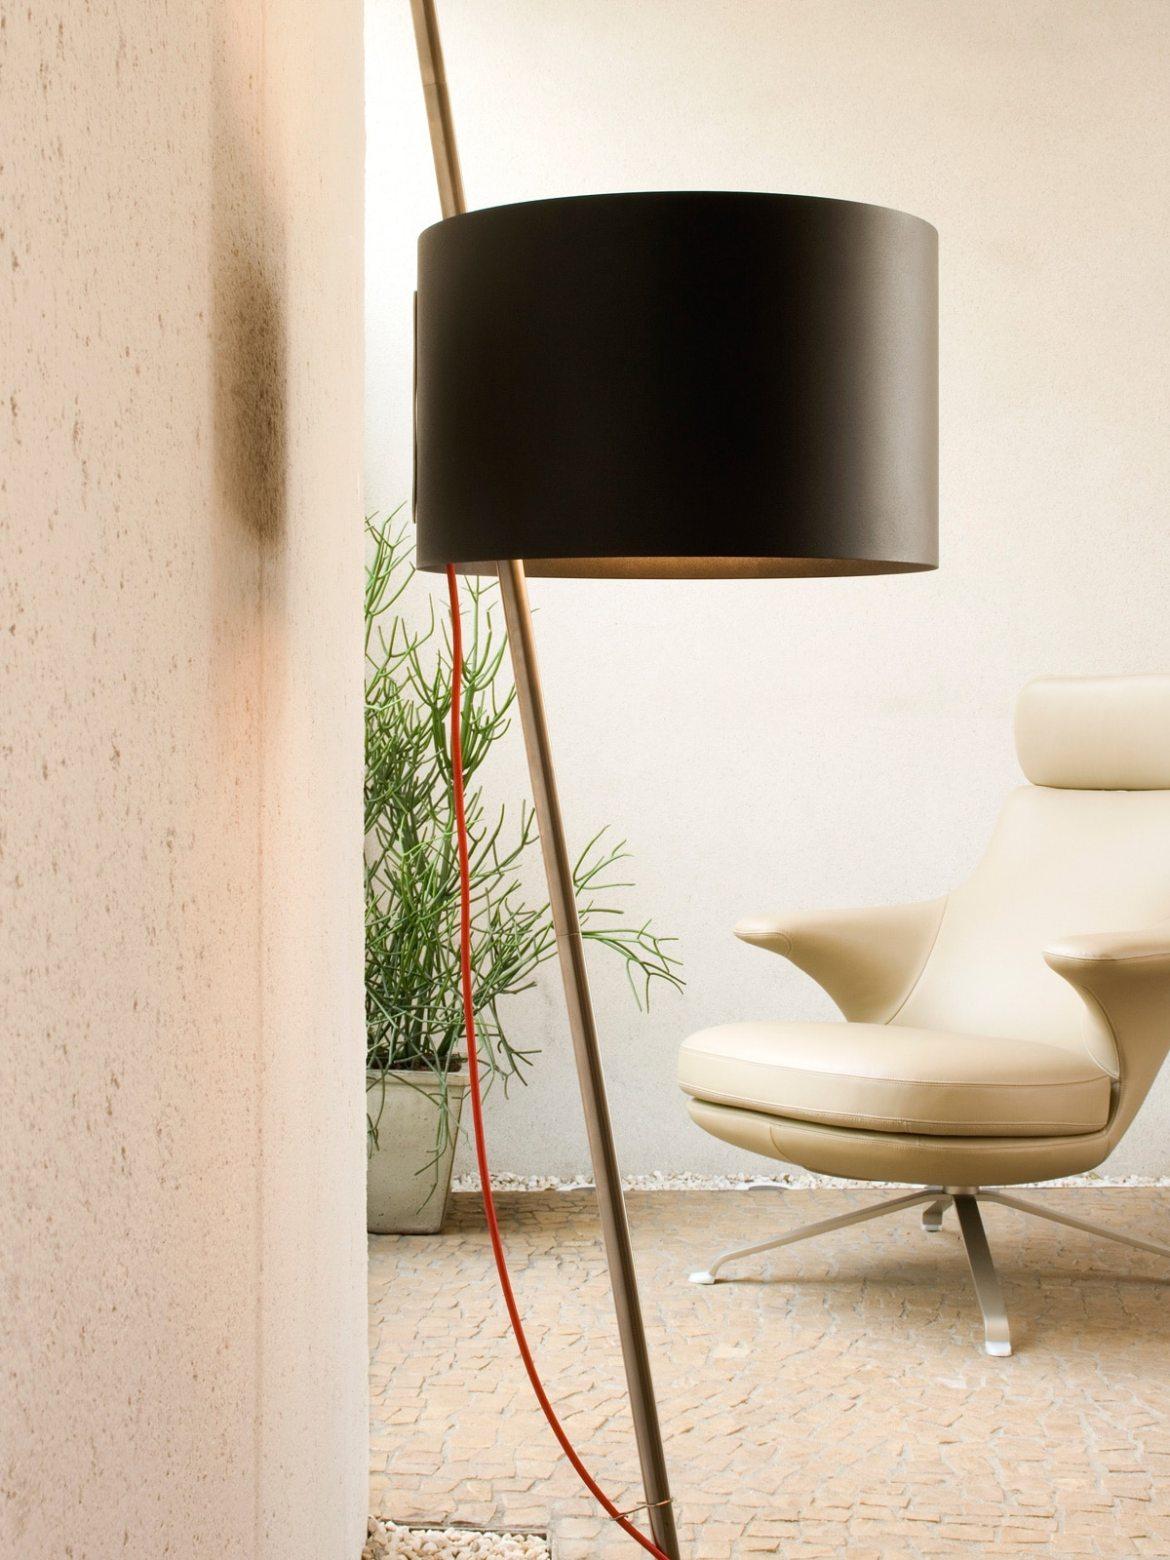 DesignOrt Blog: Designer im Portrait Fernando Prado Lumini Lift Stehleuchte Lampe